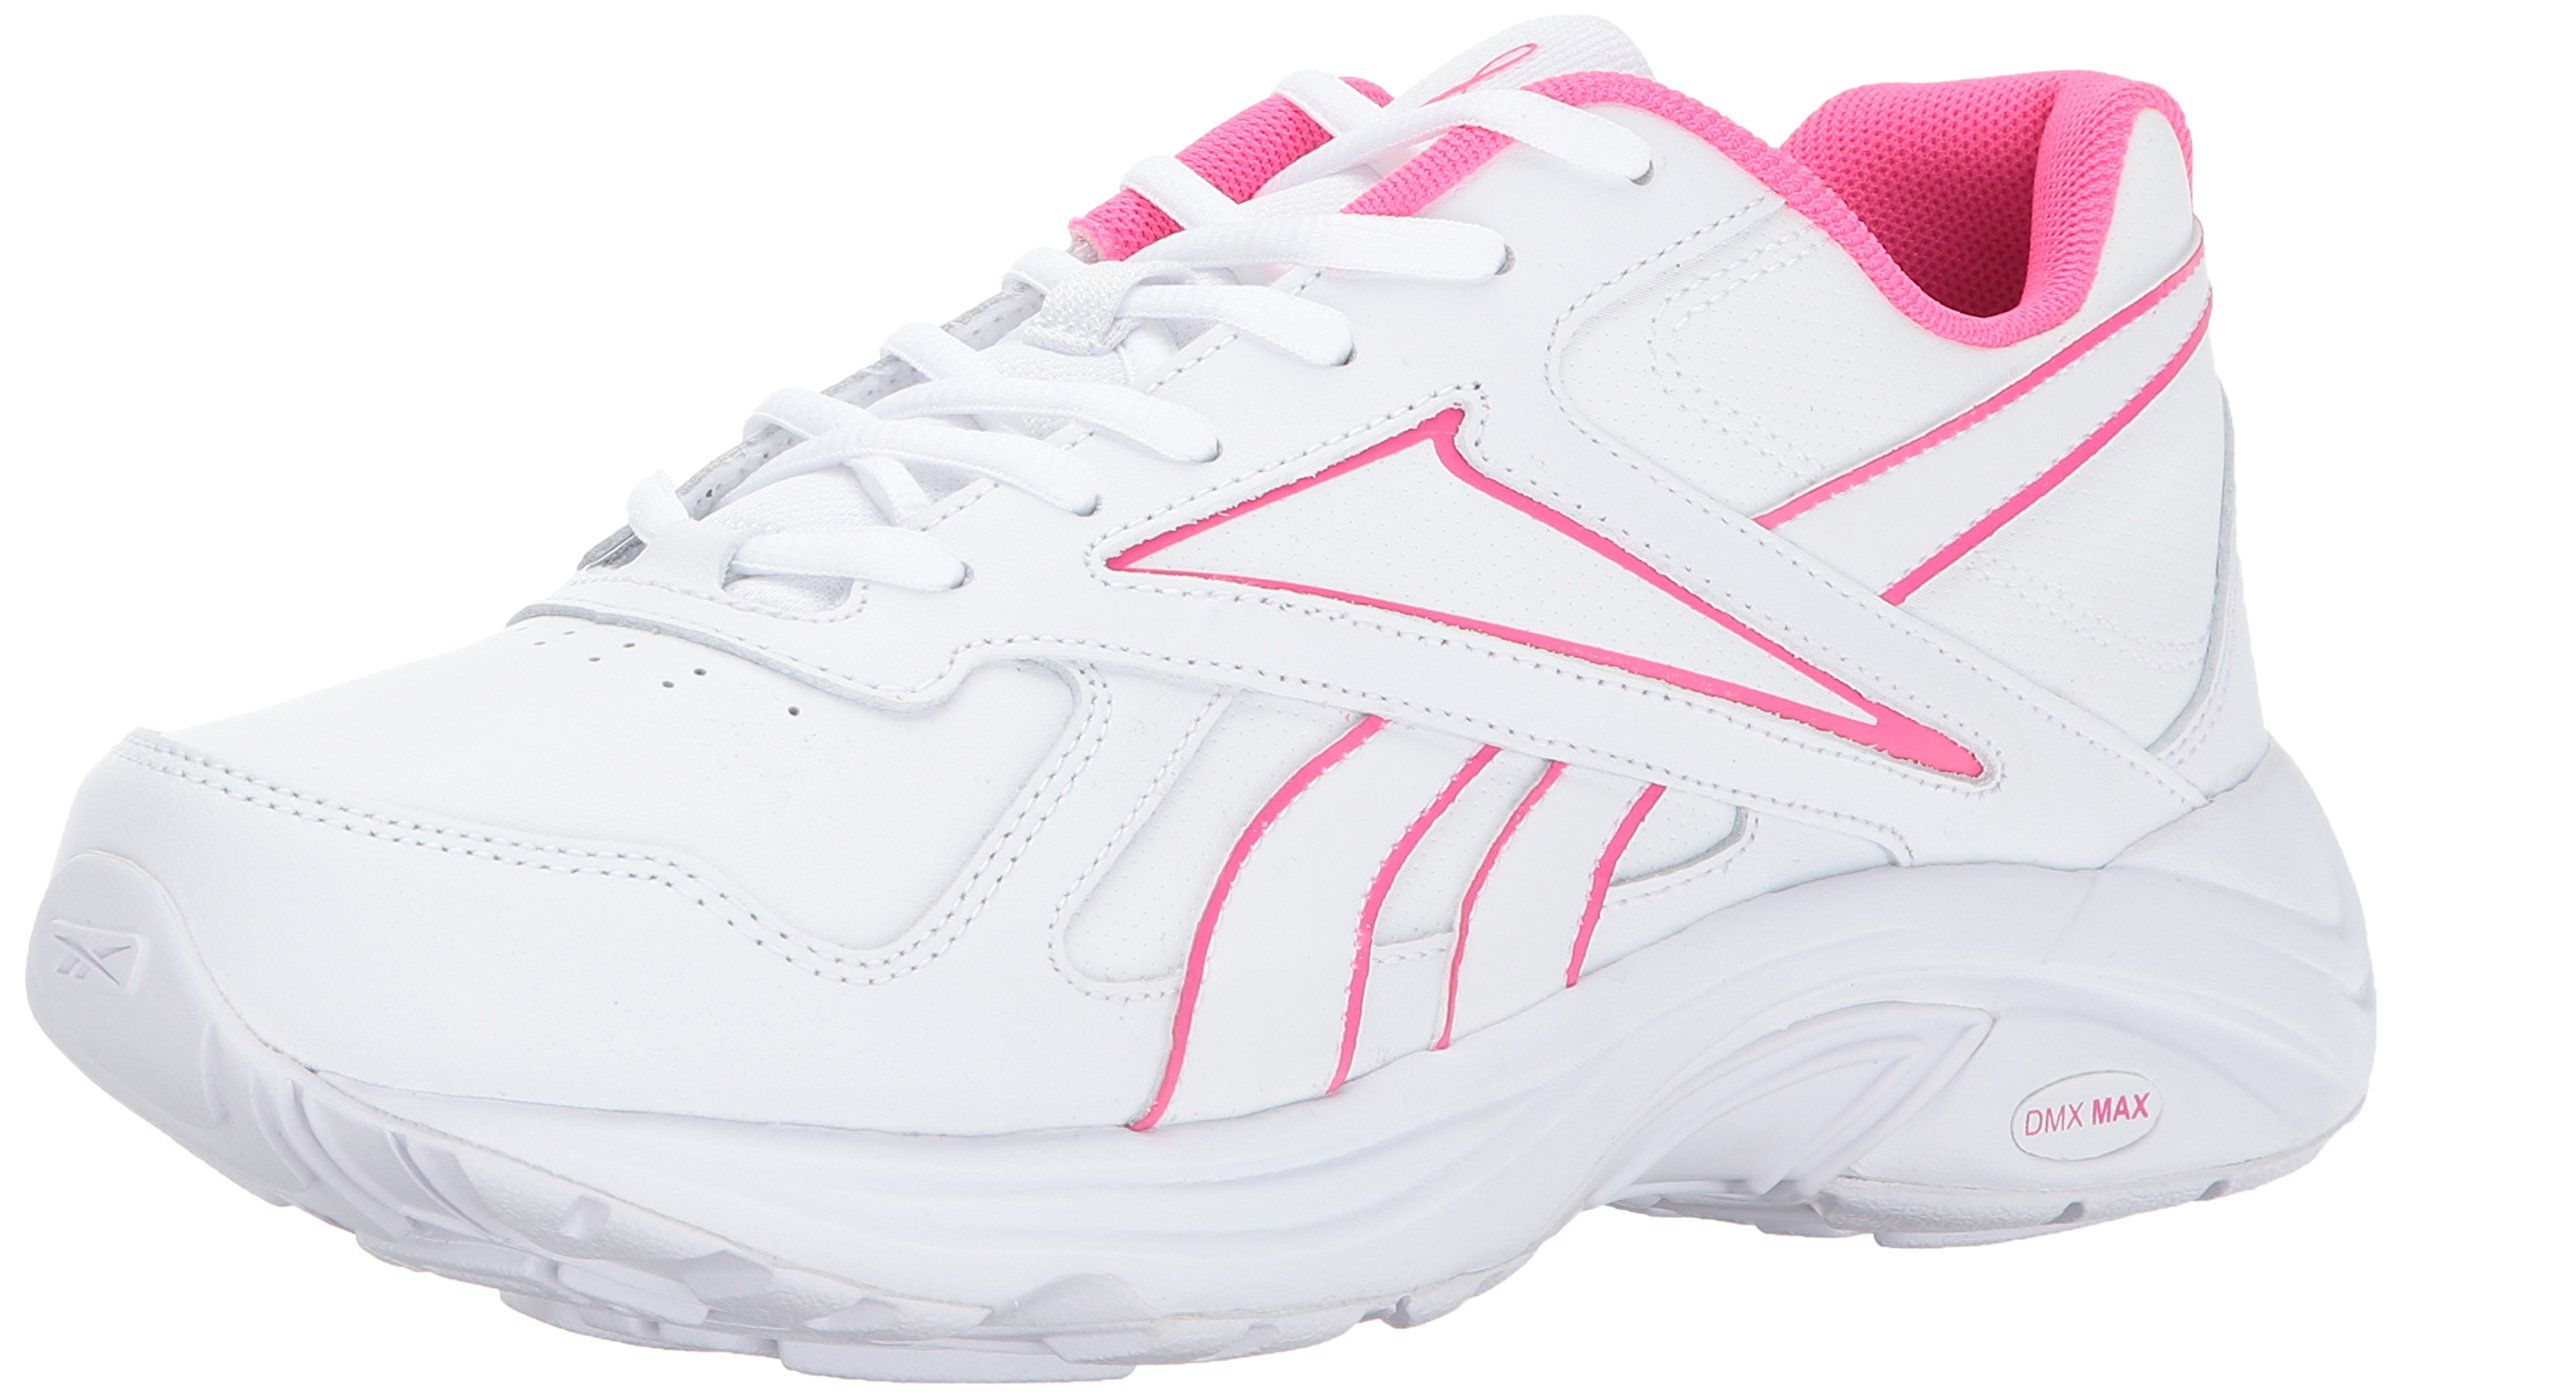 42e58d4705f766 Reebok Womens Walk Ultra V Dmx Max Track Shoe PrWhite Solar Pink 9 M US      Visit the image link more details. (It is Amazon affiliate link)   ...